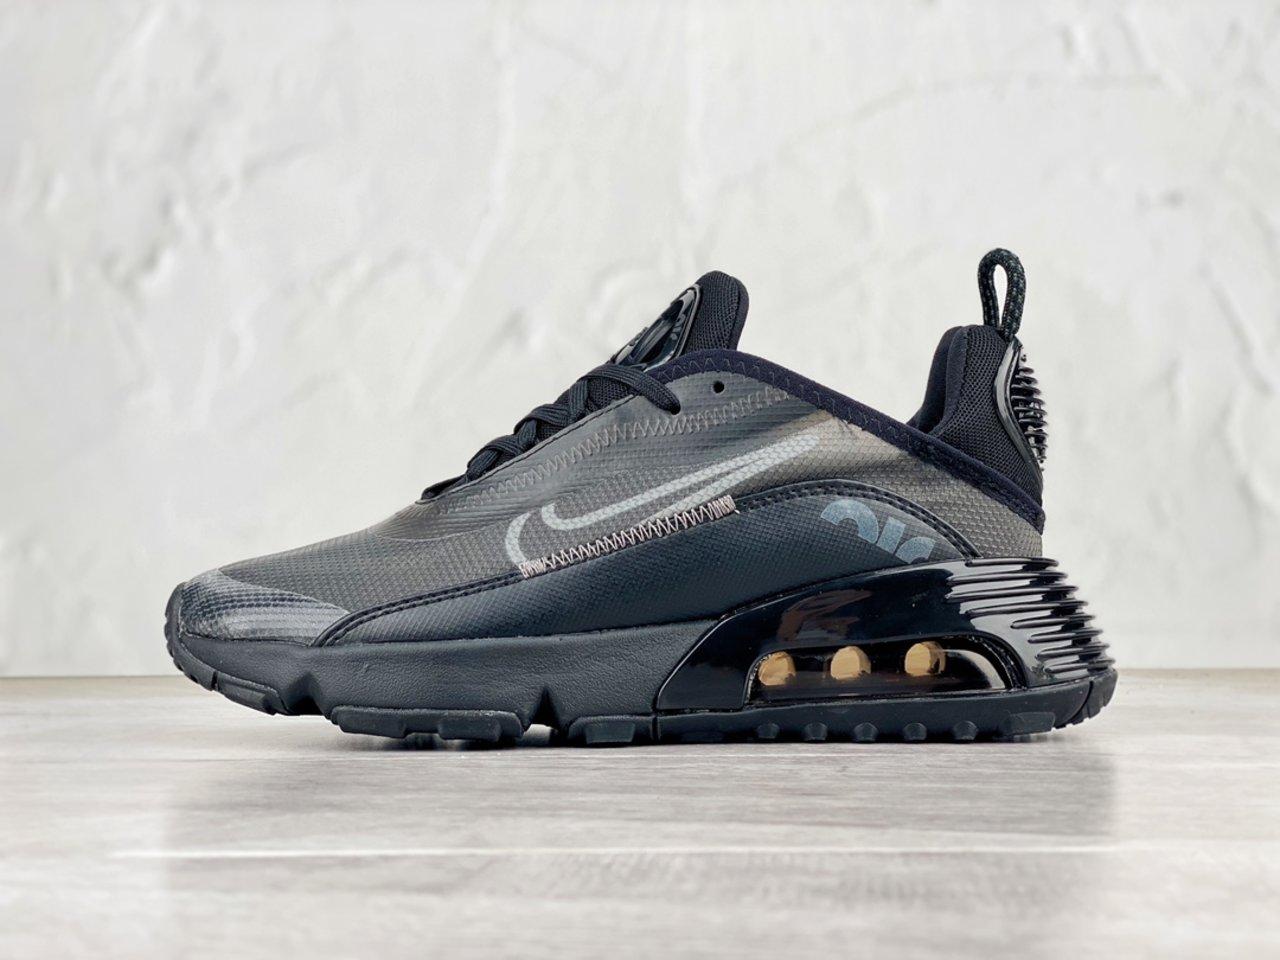 Fashion Nike Air Max 2090 Black Wolf Grey Outlet Sale BV9977-001